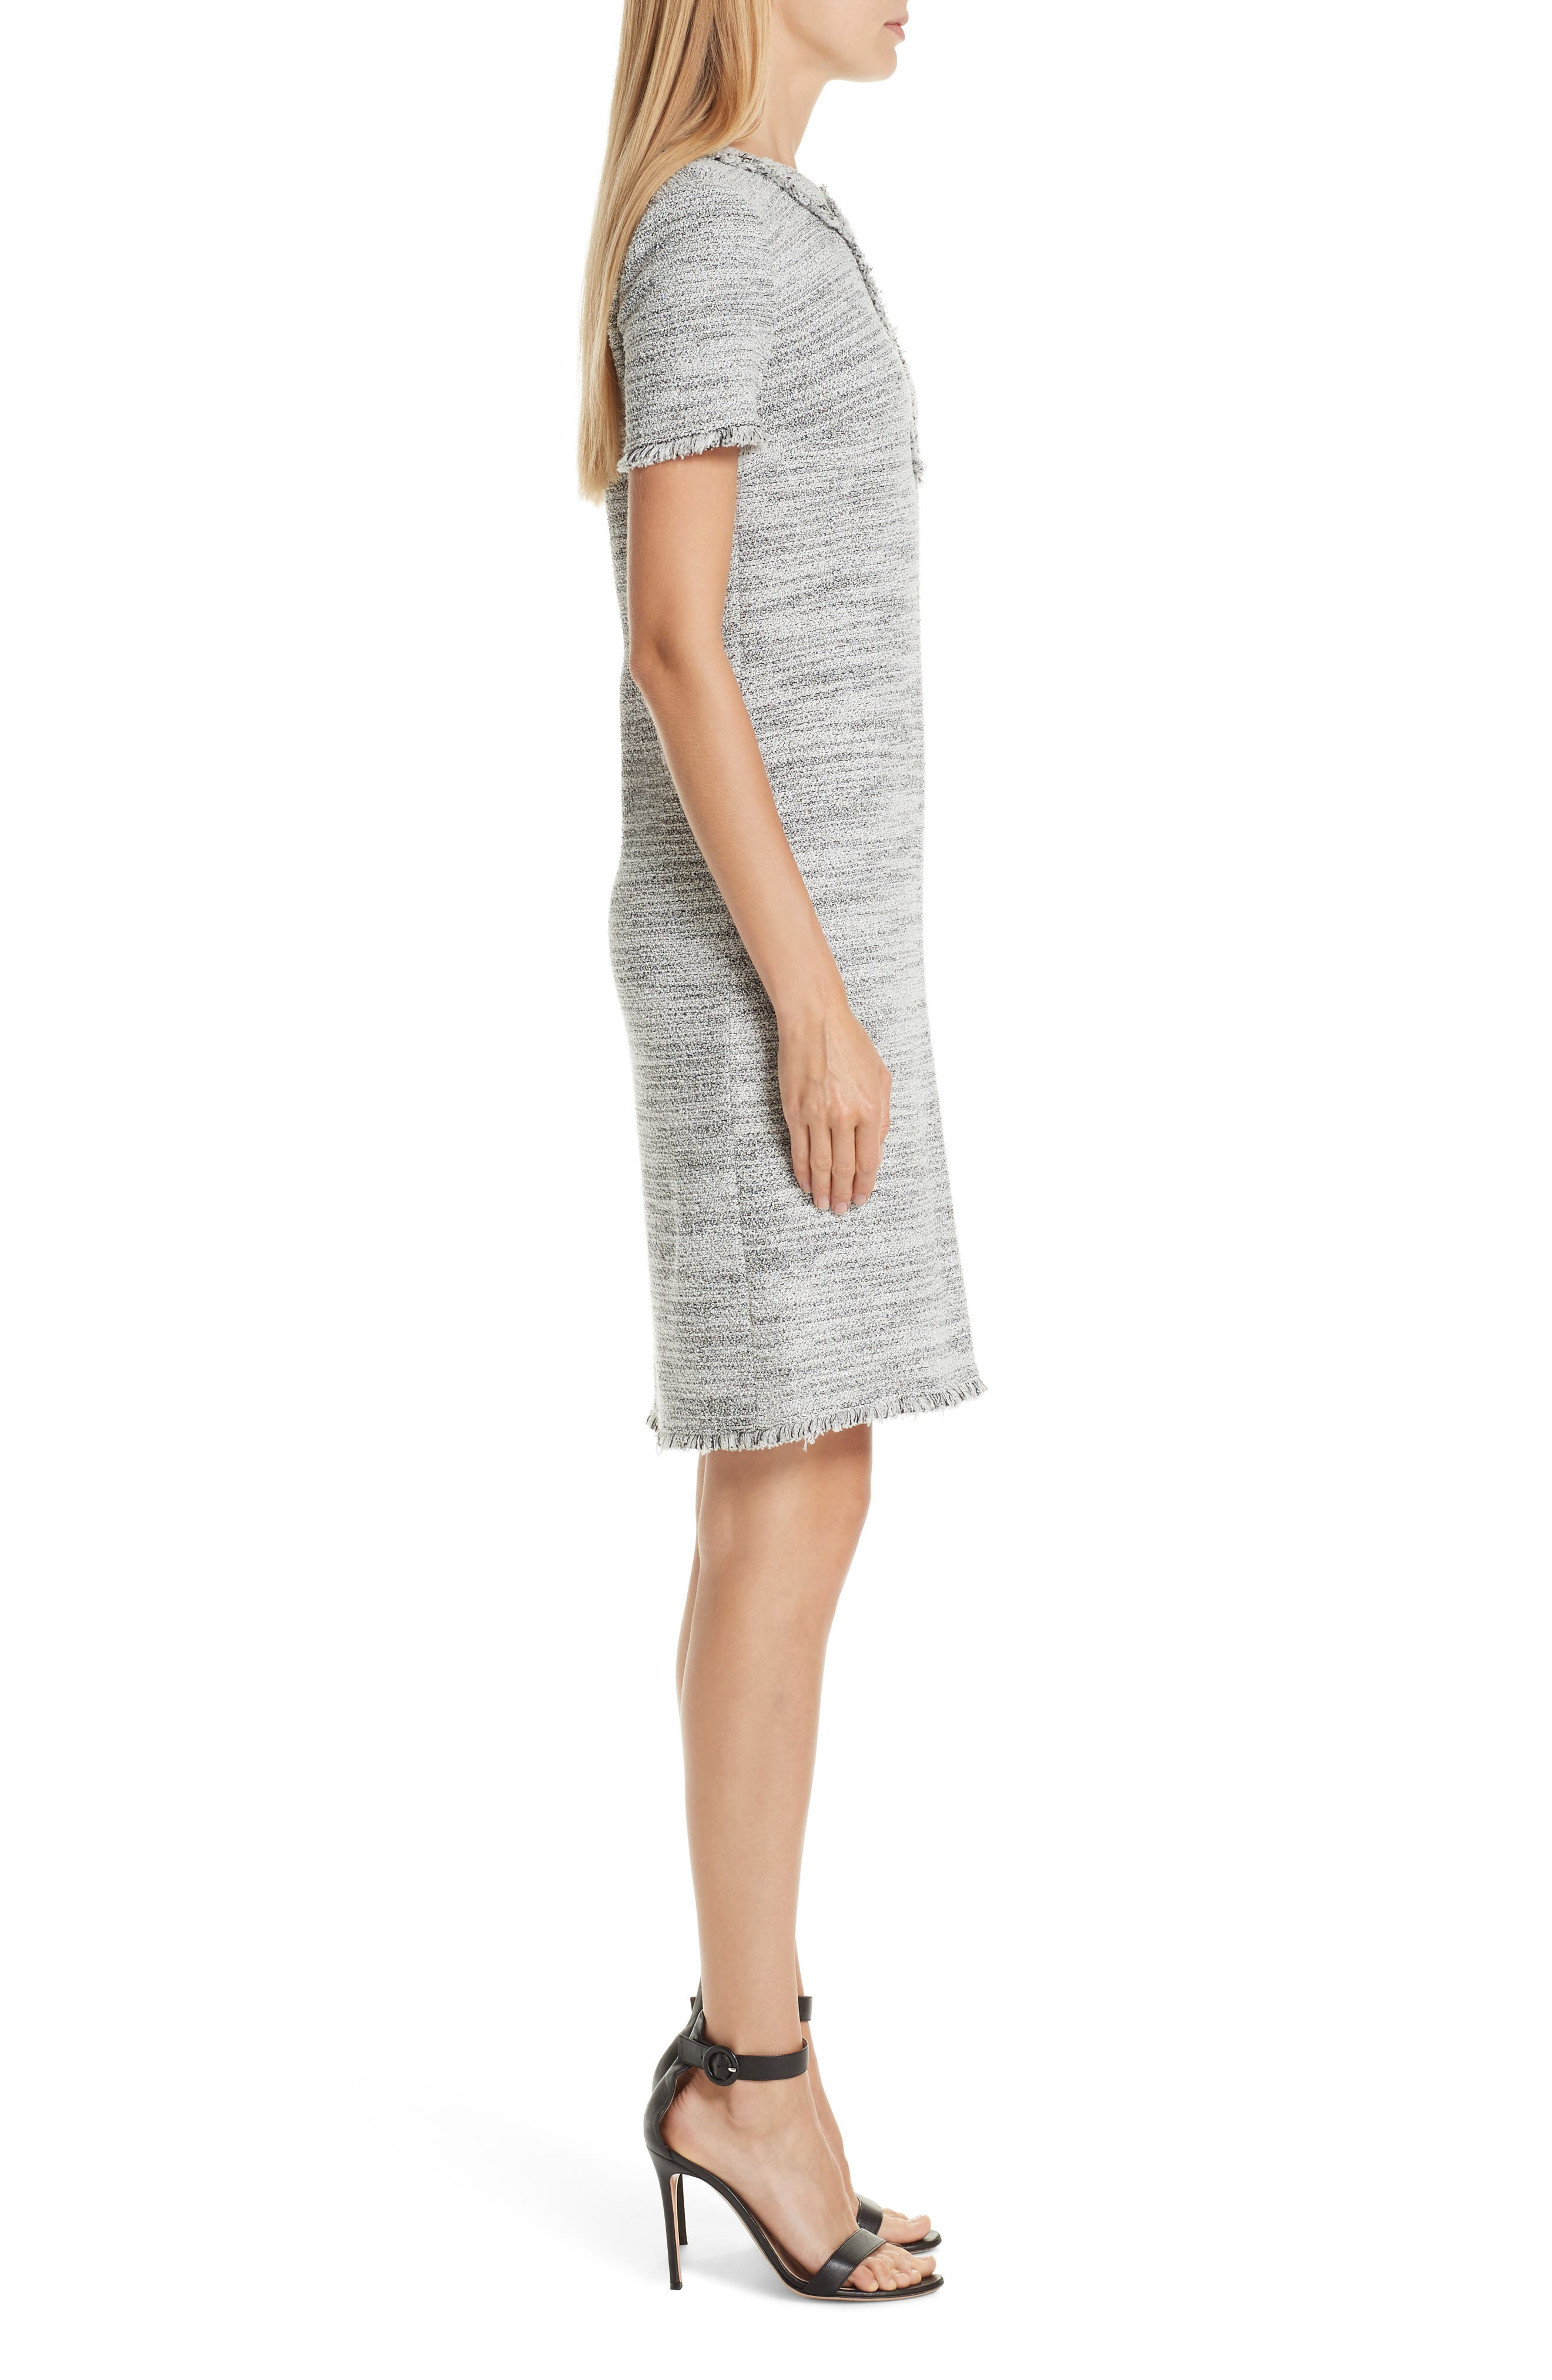 ST. JOHN COLLECTION, Eaton Place Tweed Knit Dress, Alternate thumbnail 4, color, CAVIAR/ CREAM